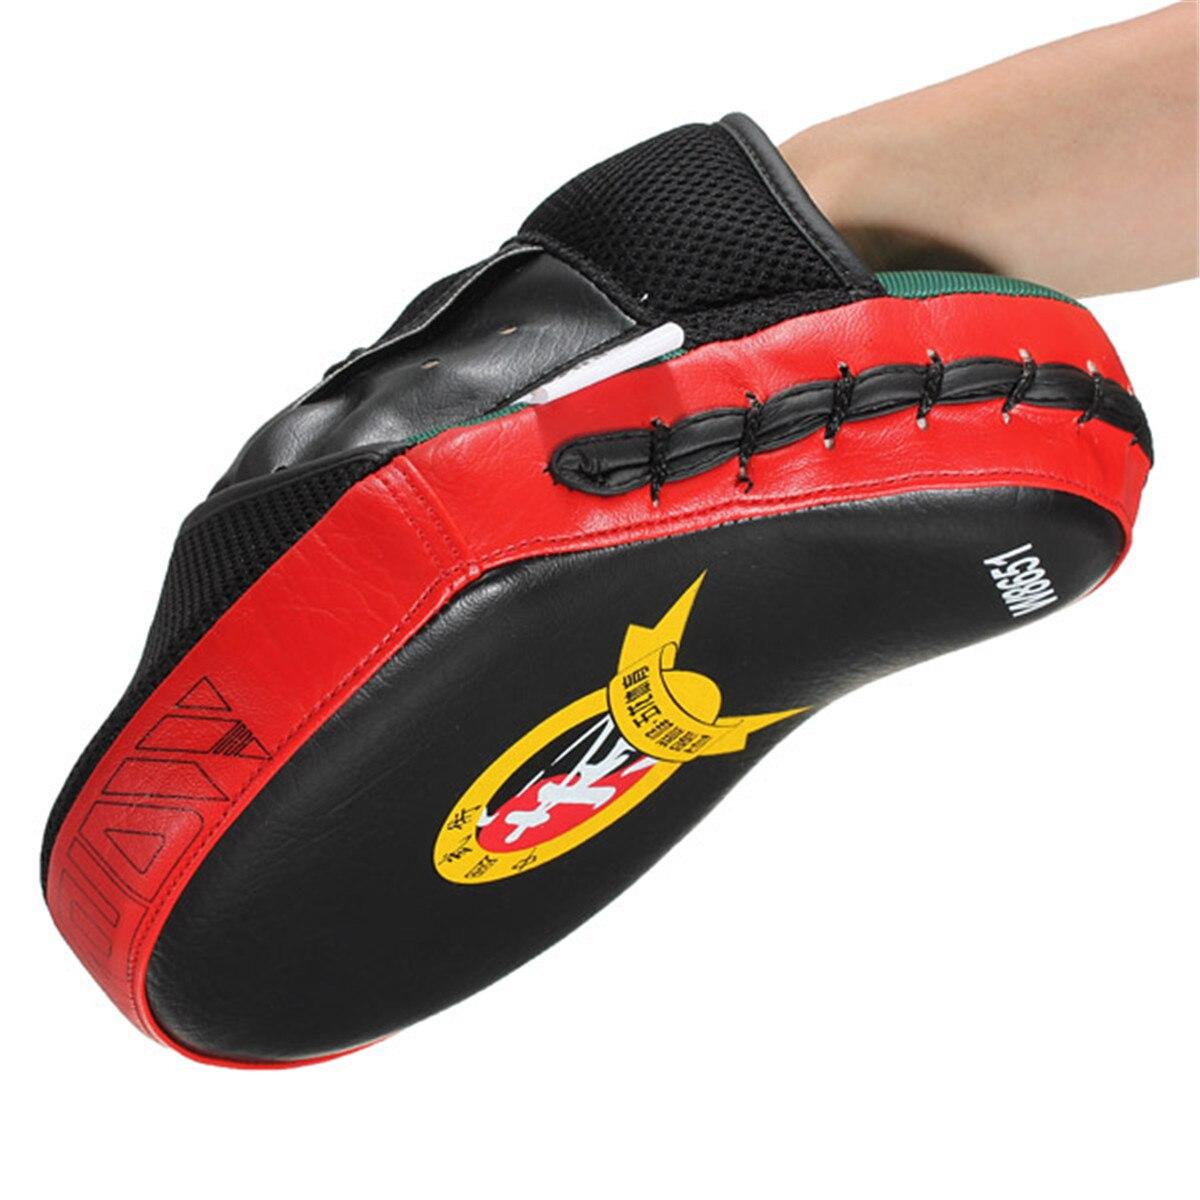 Mens leather gloves target -  Online Get Target Leather Gloves Aliexpress Com Alibaba Group